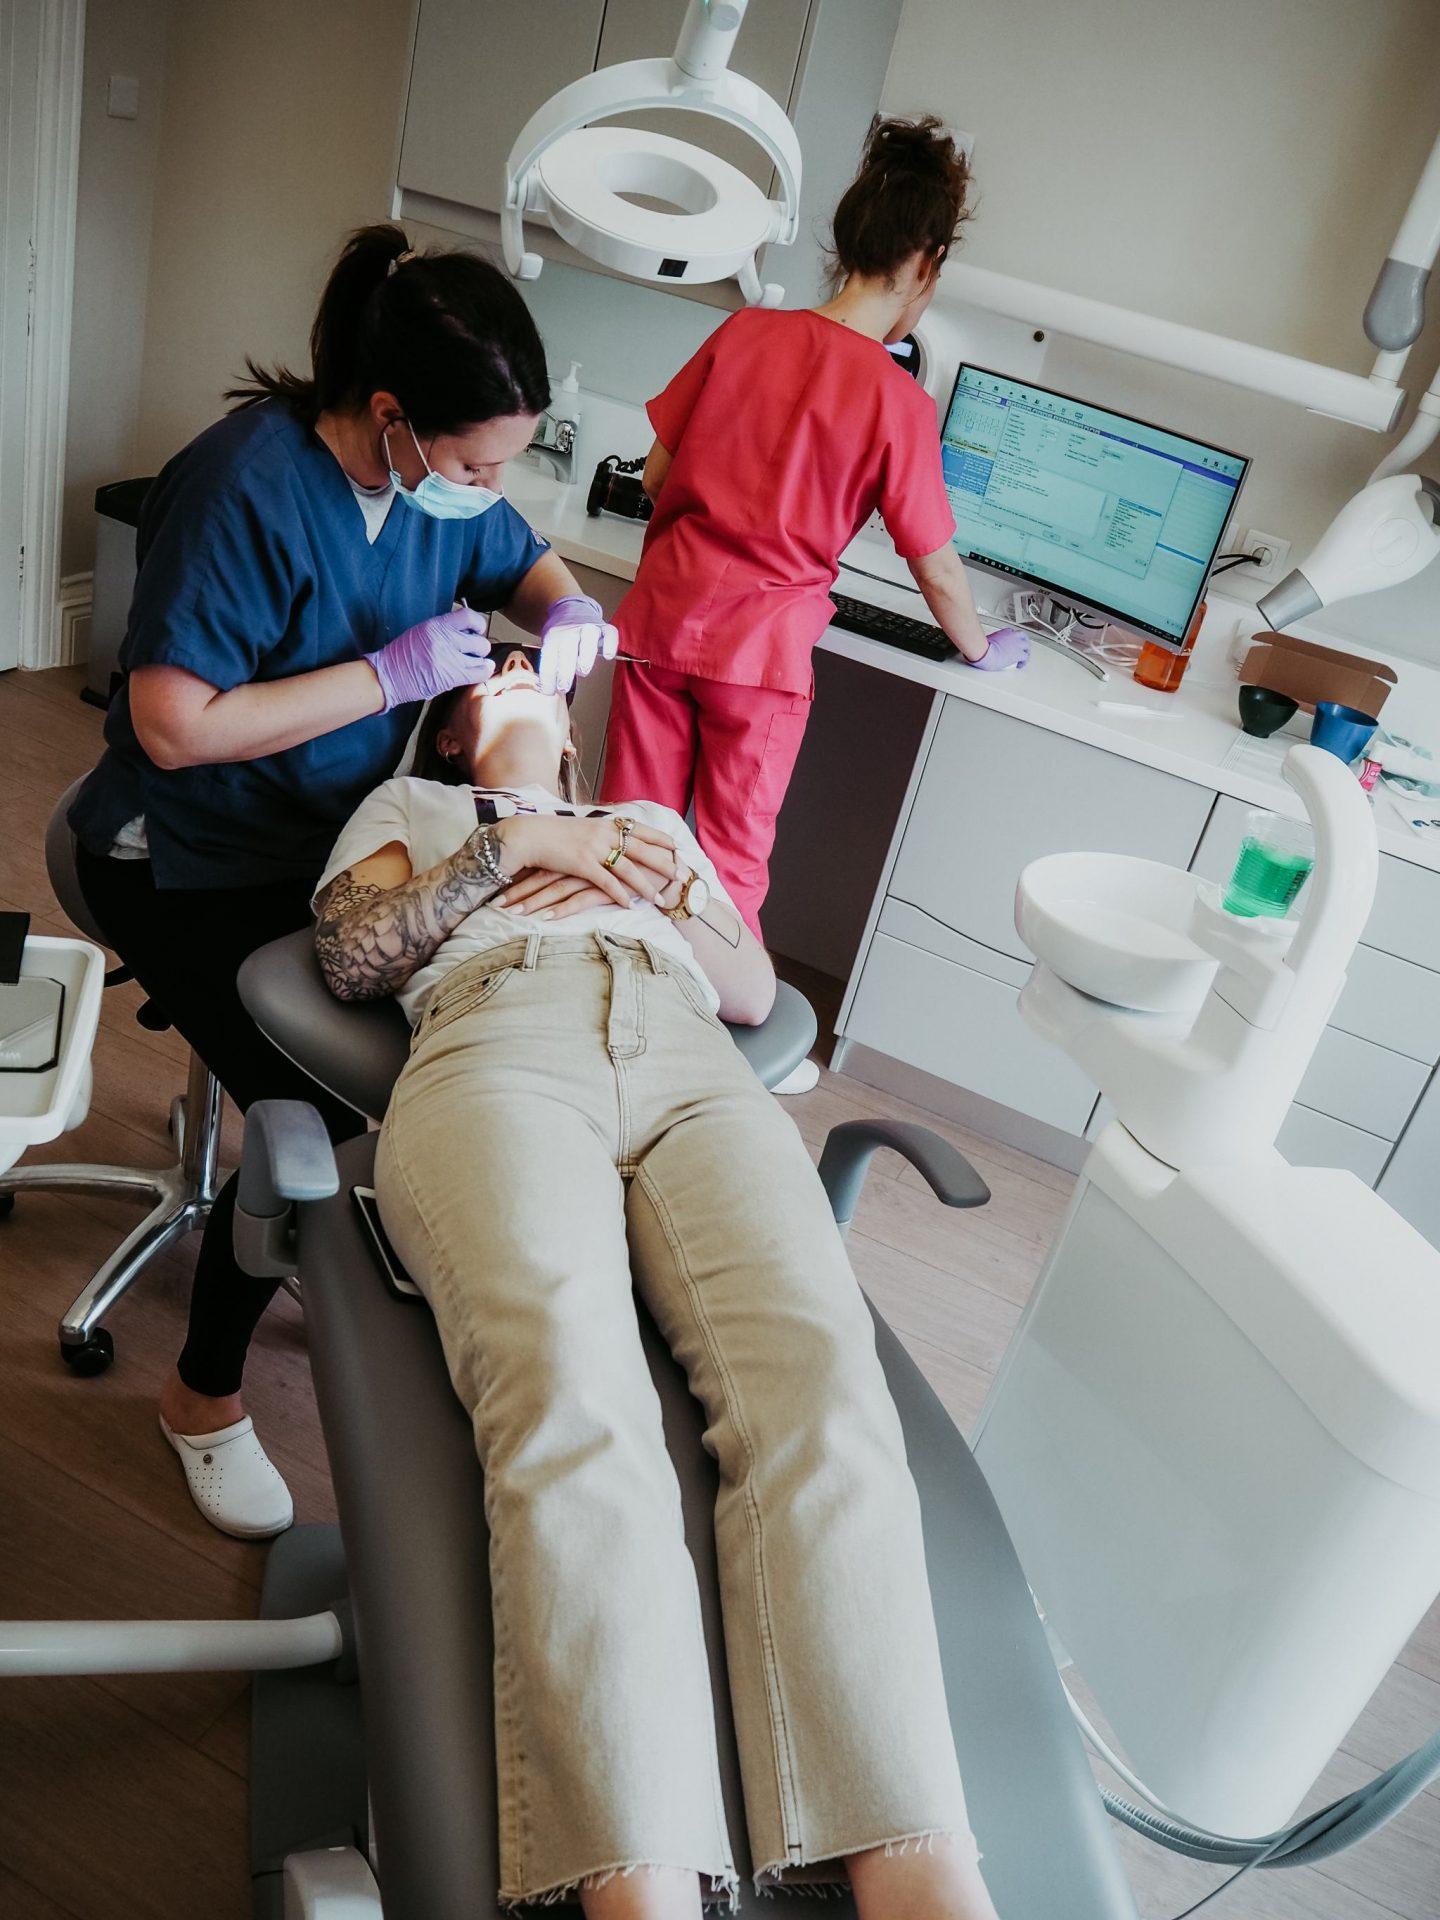 Redcliffe dental surgery Neston